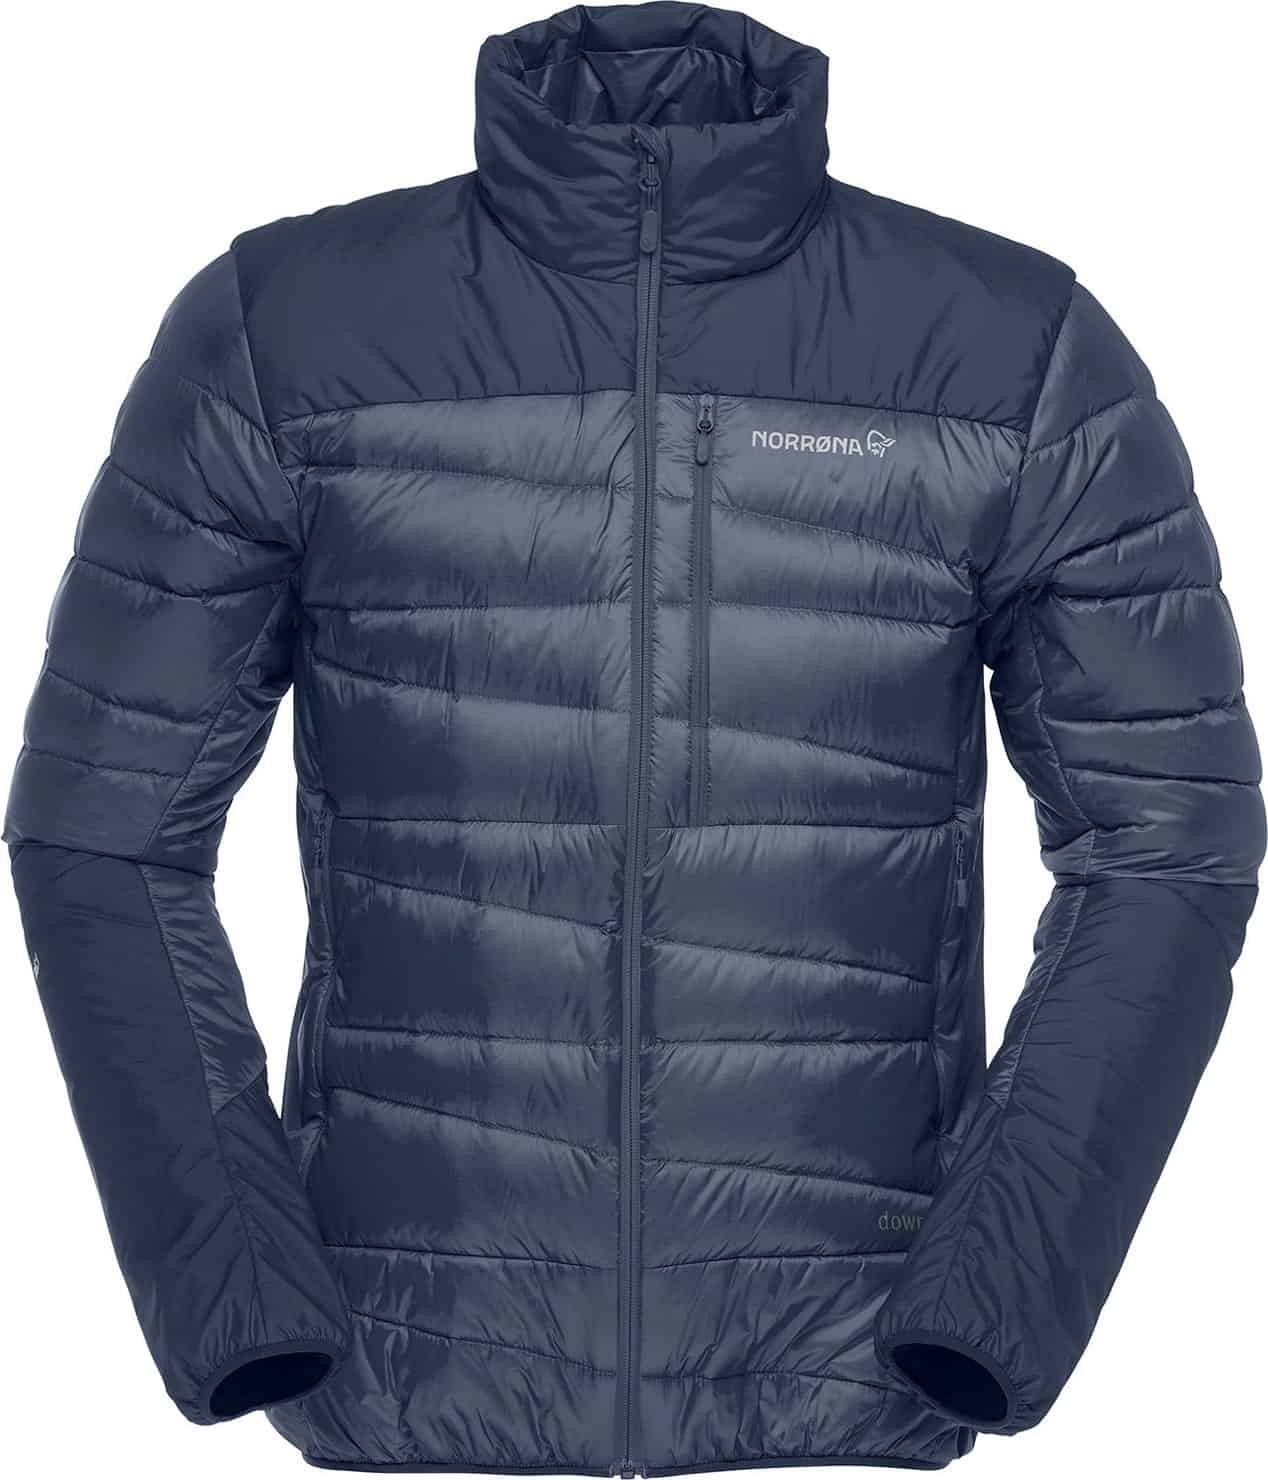 Norrona - Falketind Down750 Jacket - Men's